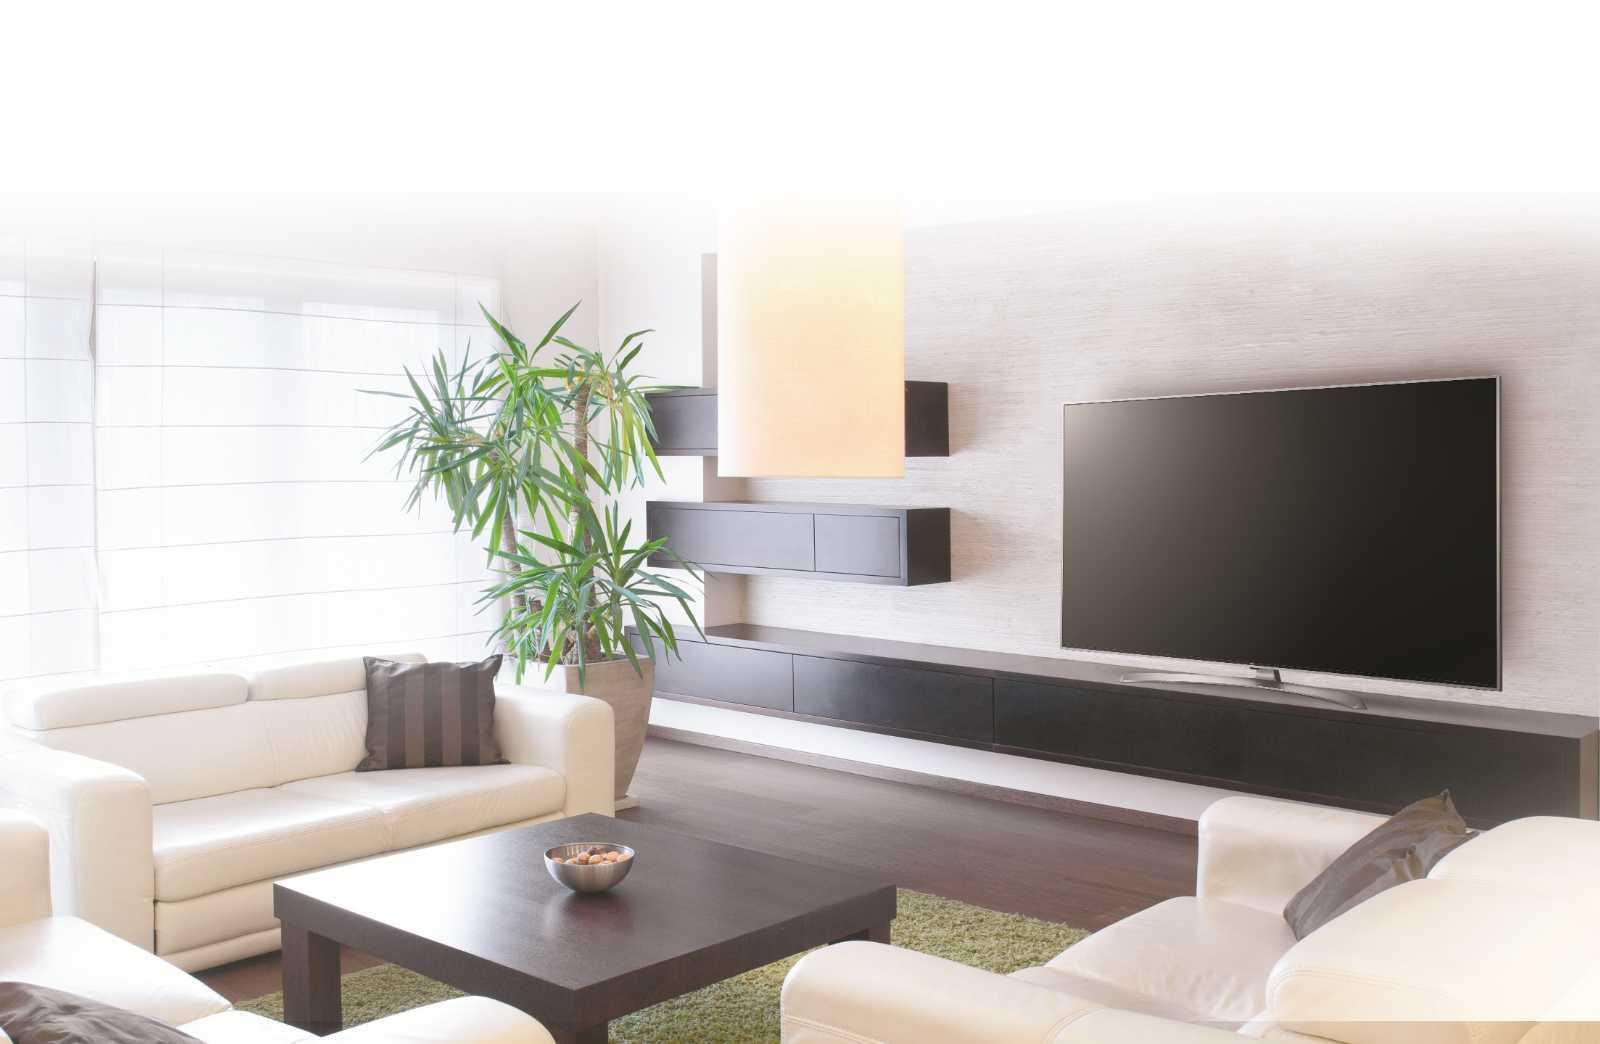 The 49UJ752T 49 LG Super UHD 4K TV | LG Australia